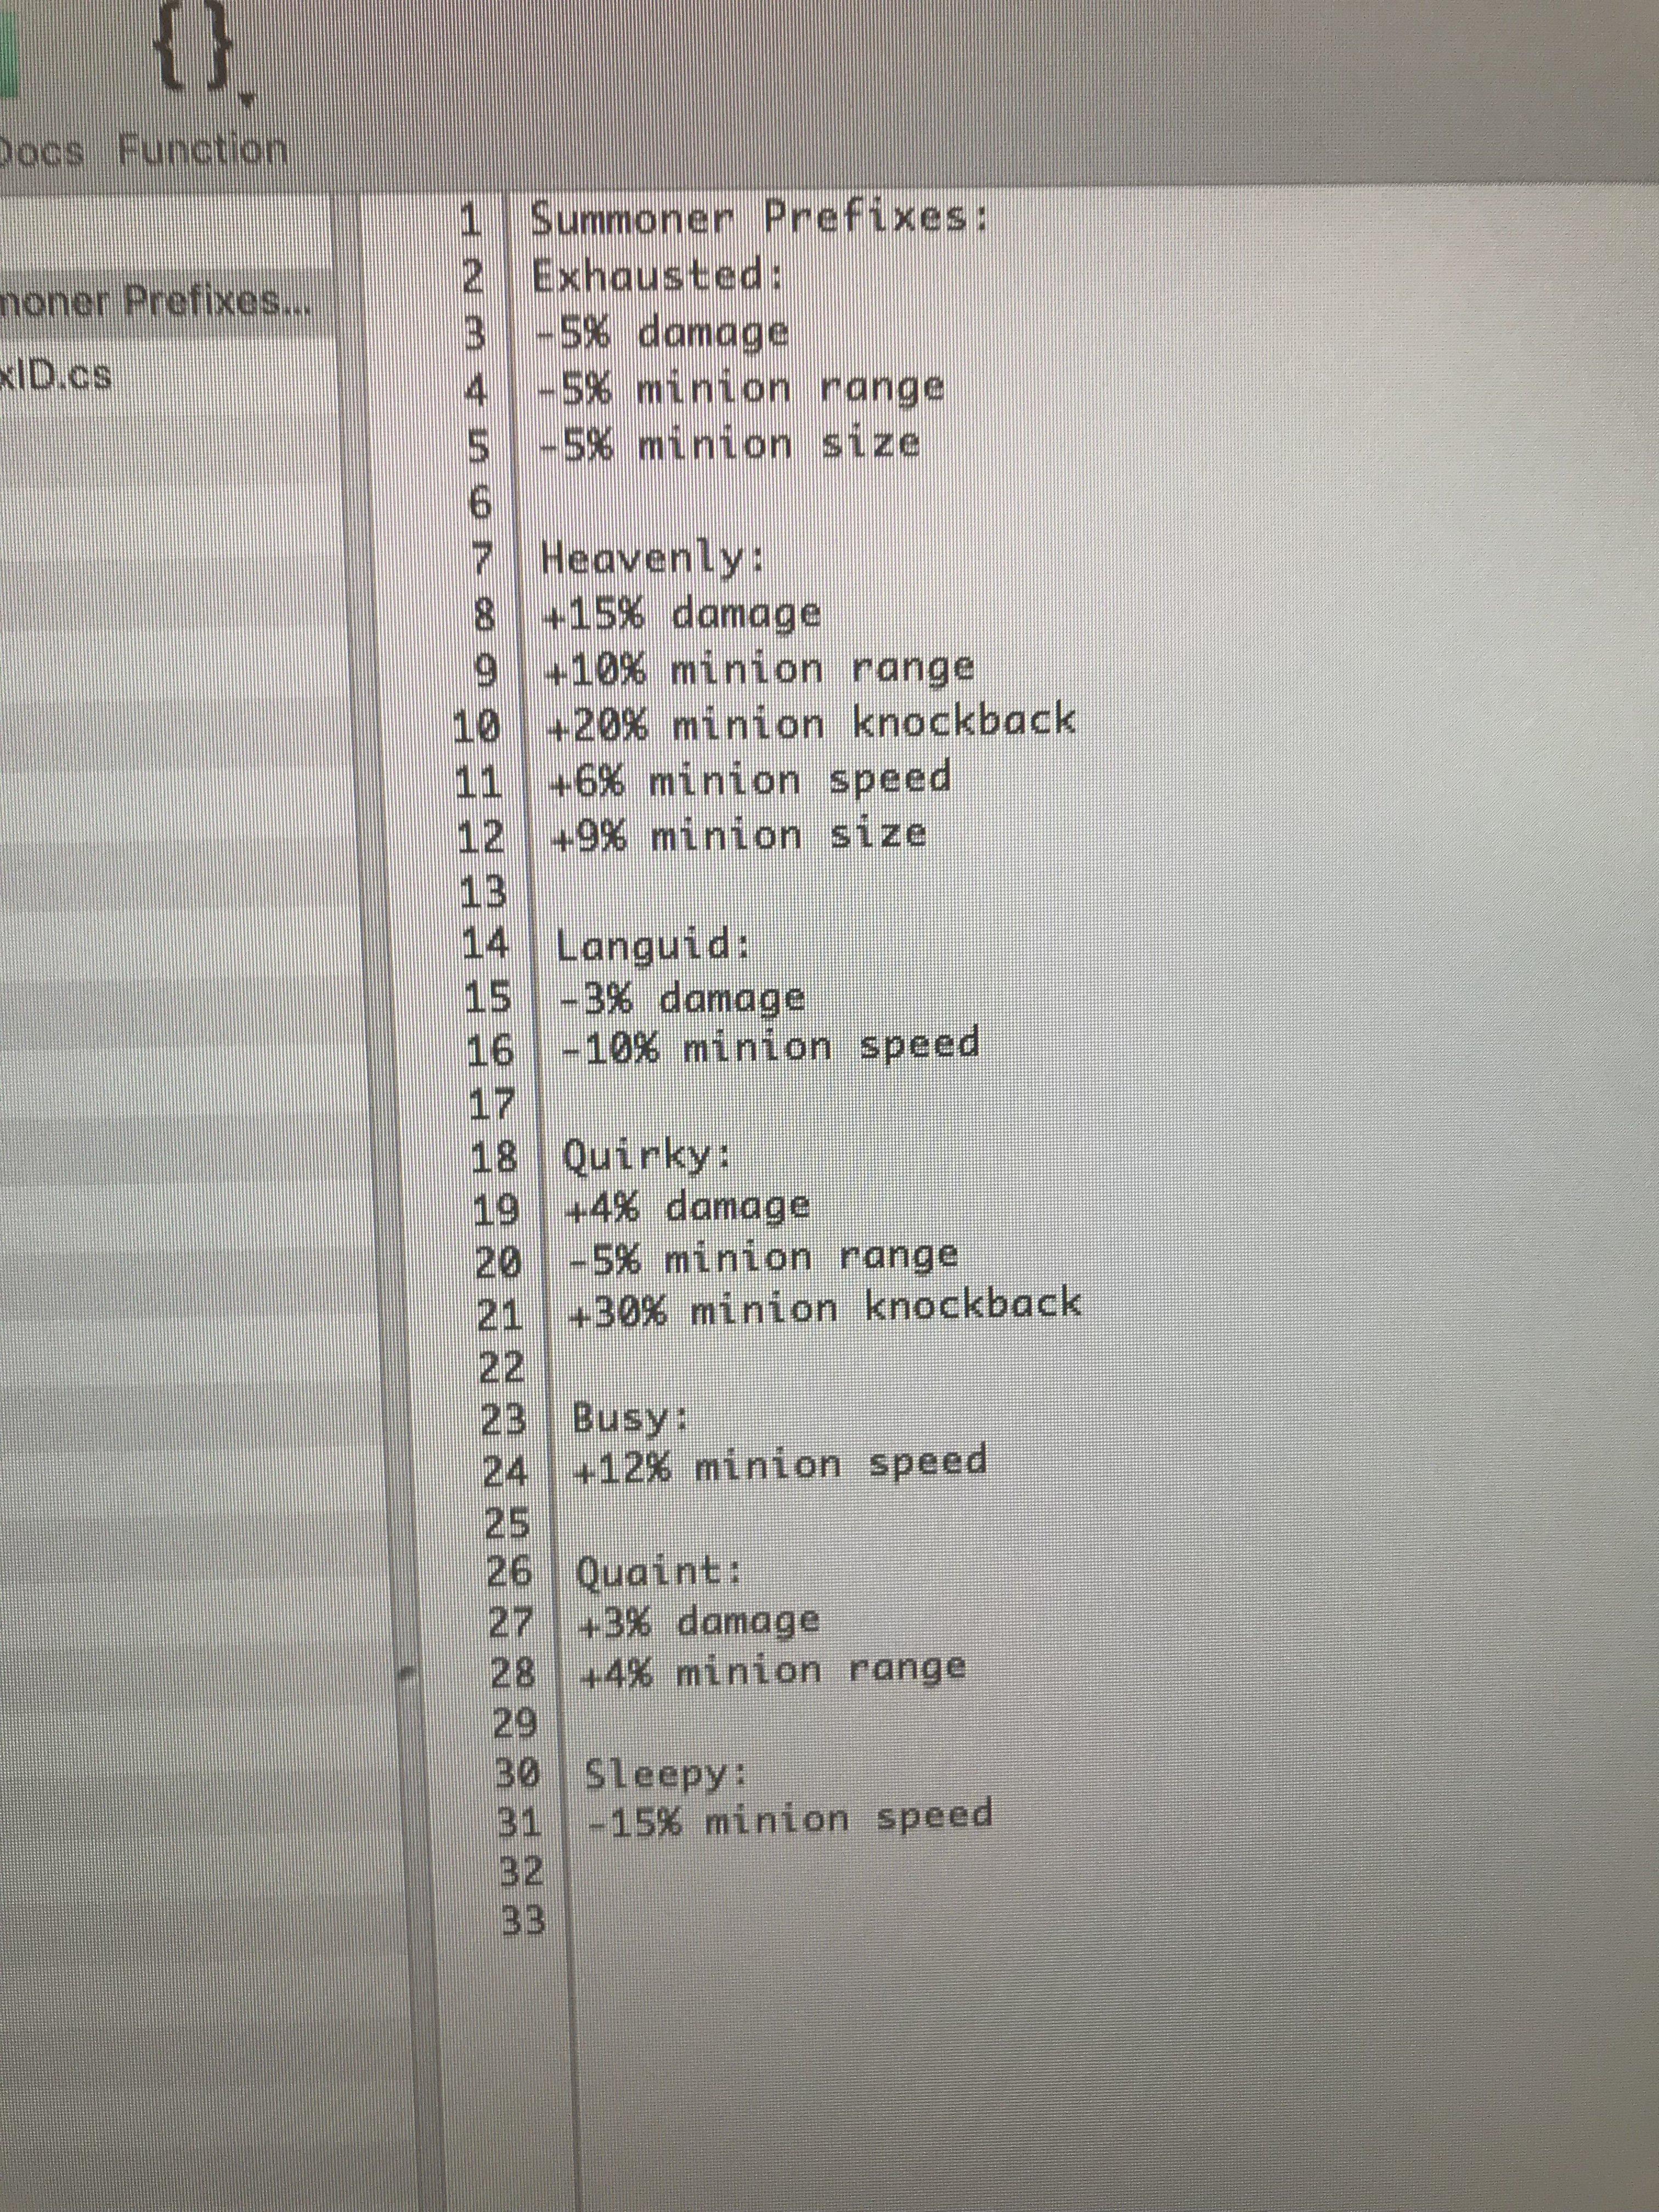 92C57DE2-0AAC-4AB0-86A0-5F6C75814FD9.jpeg